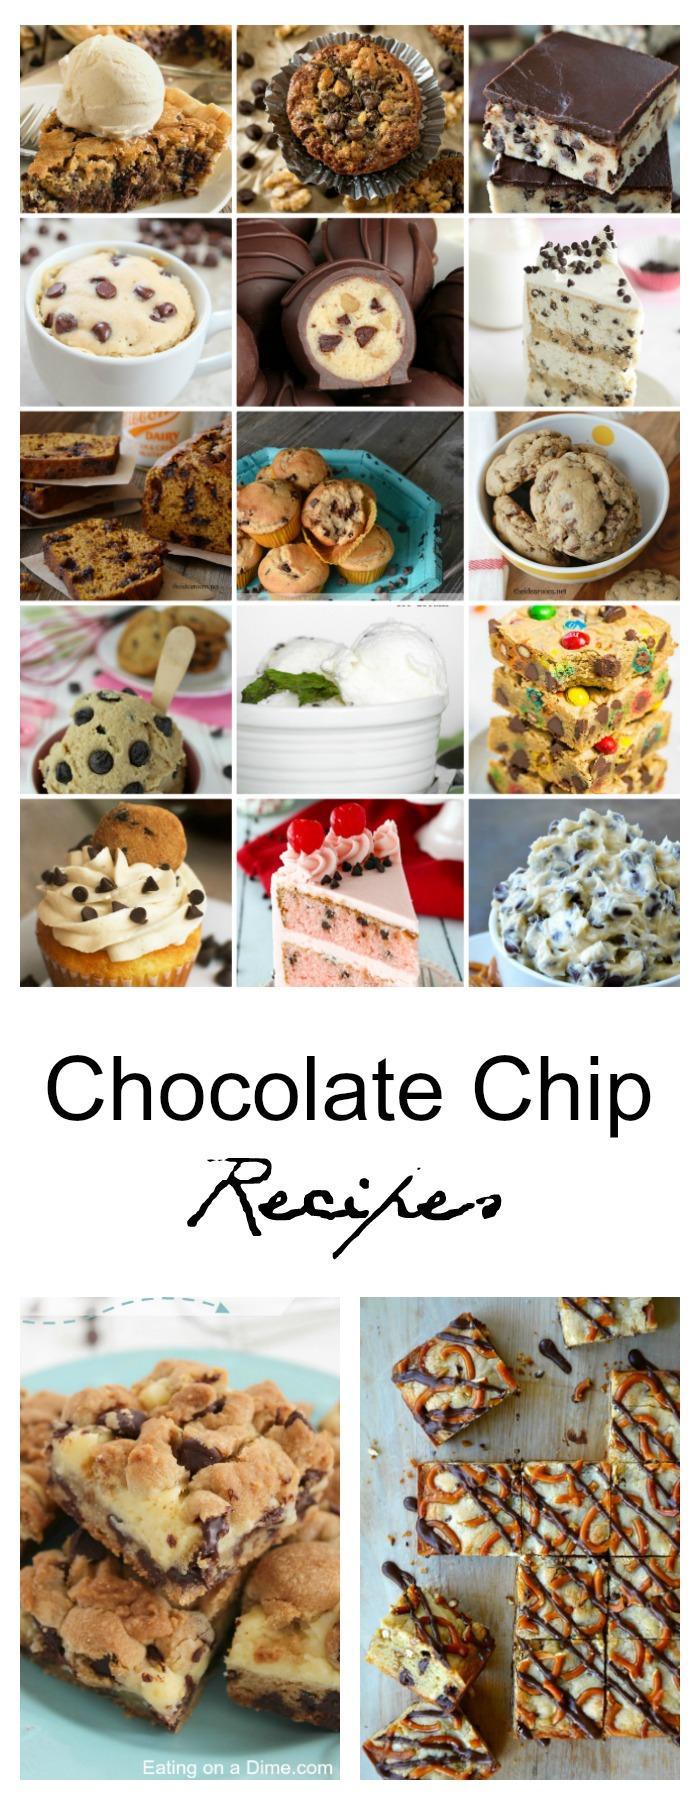 Chocolate-Chip-Recipes-Pin